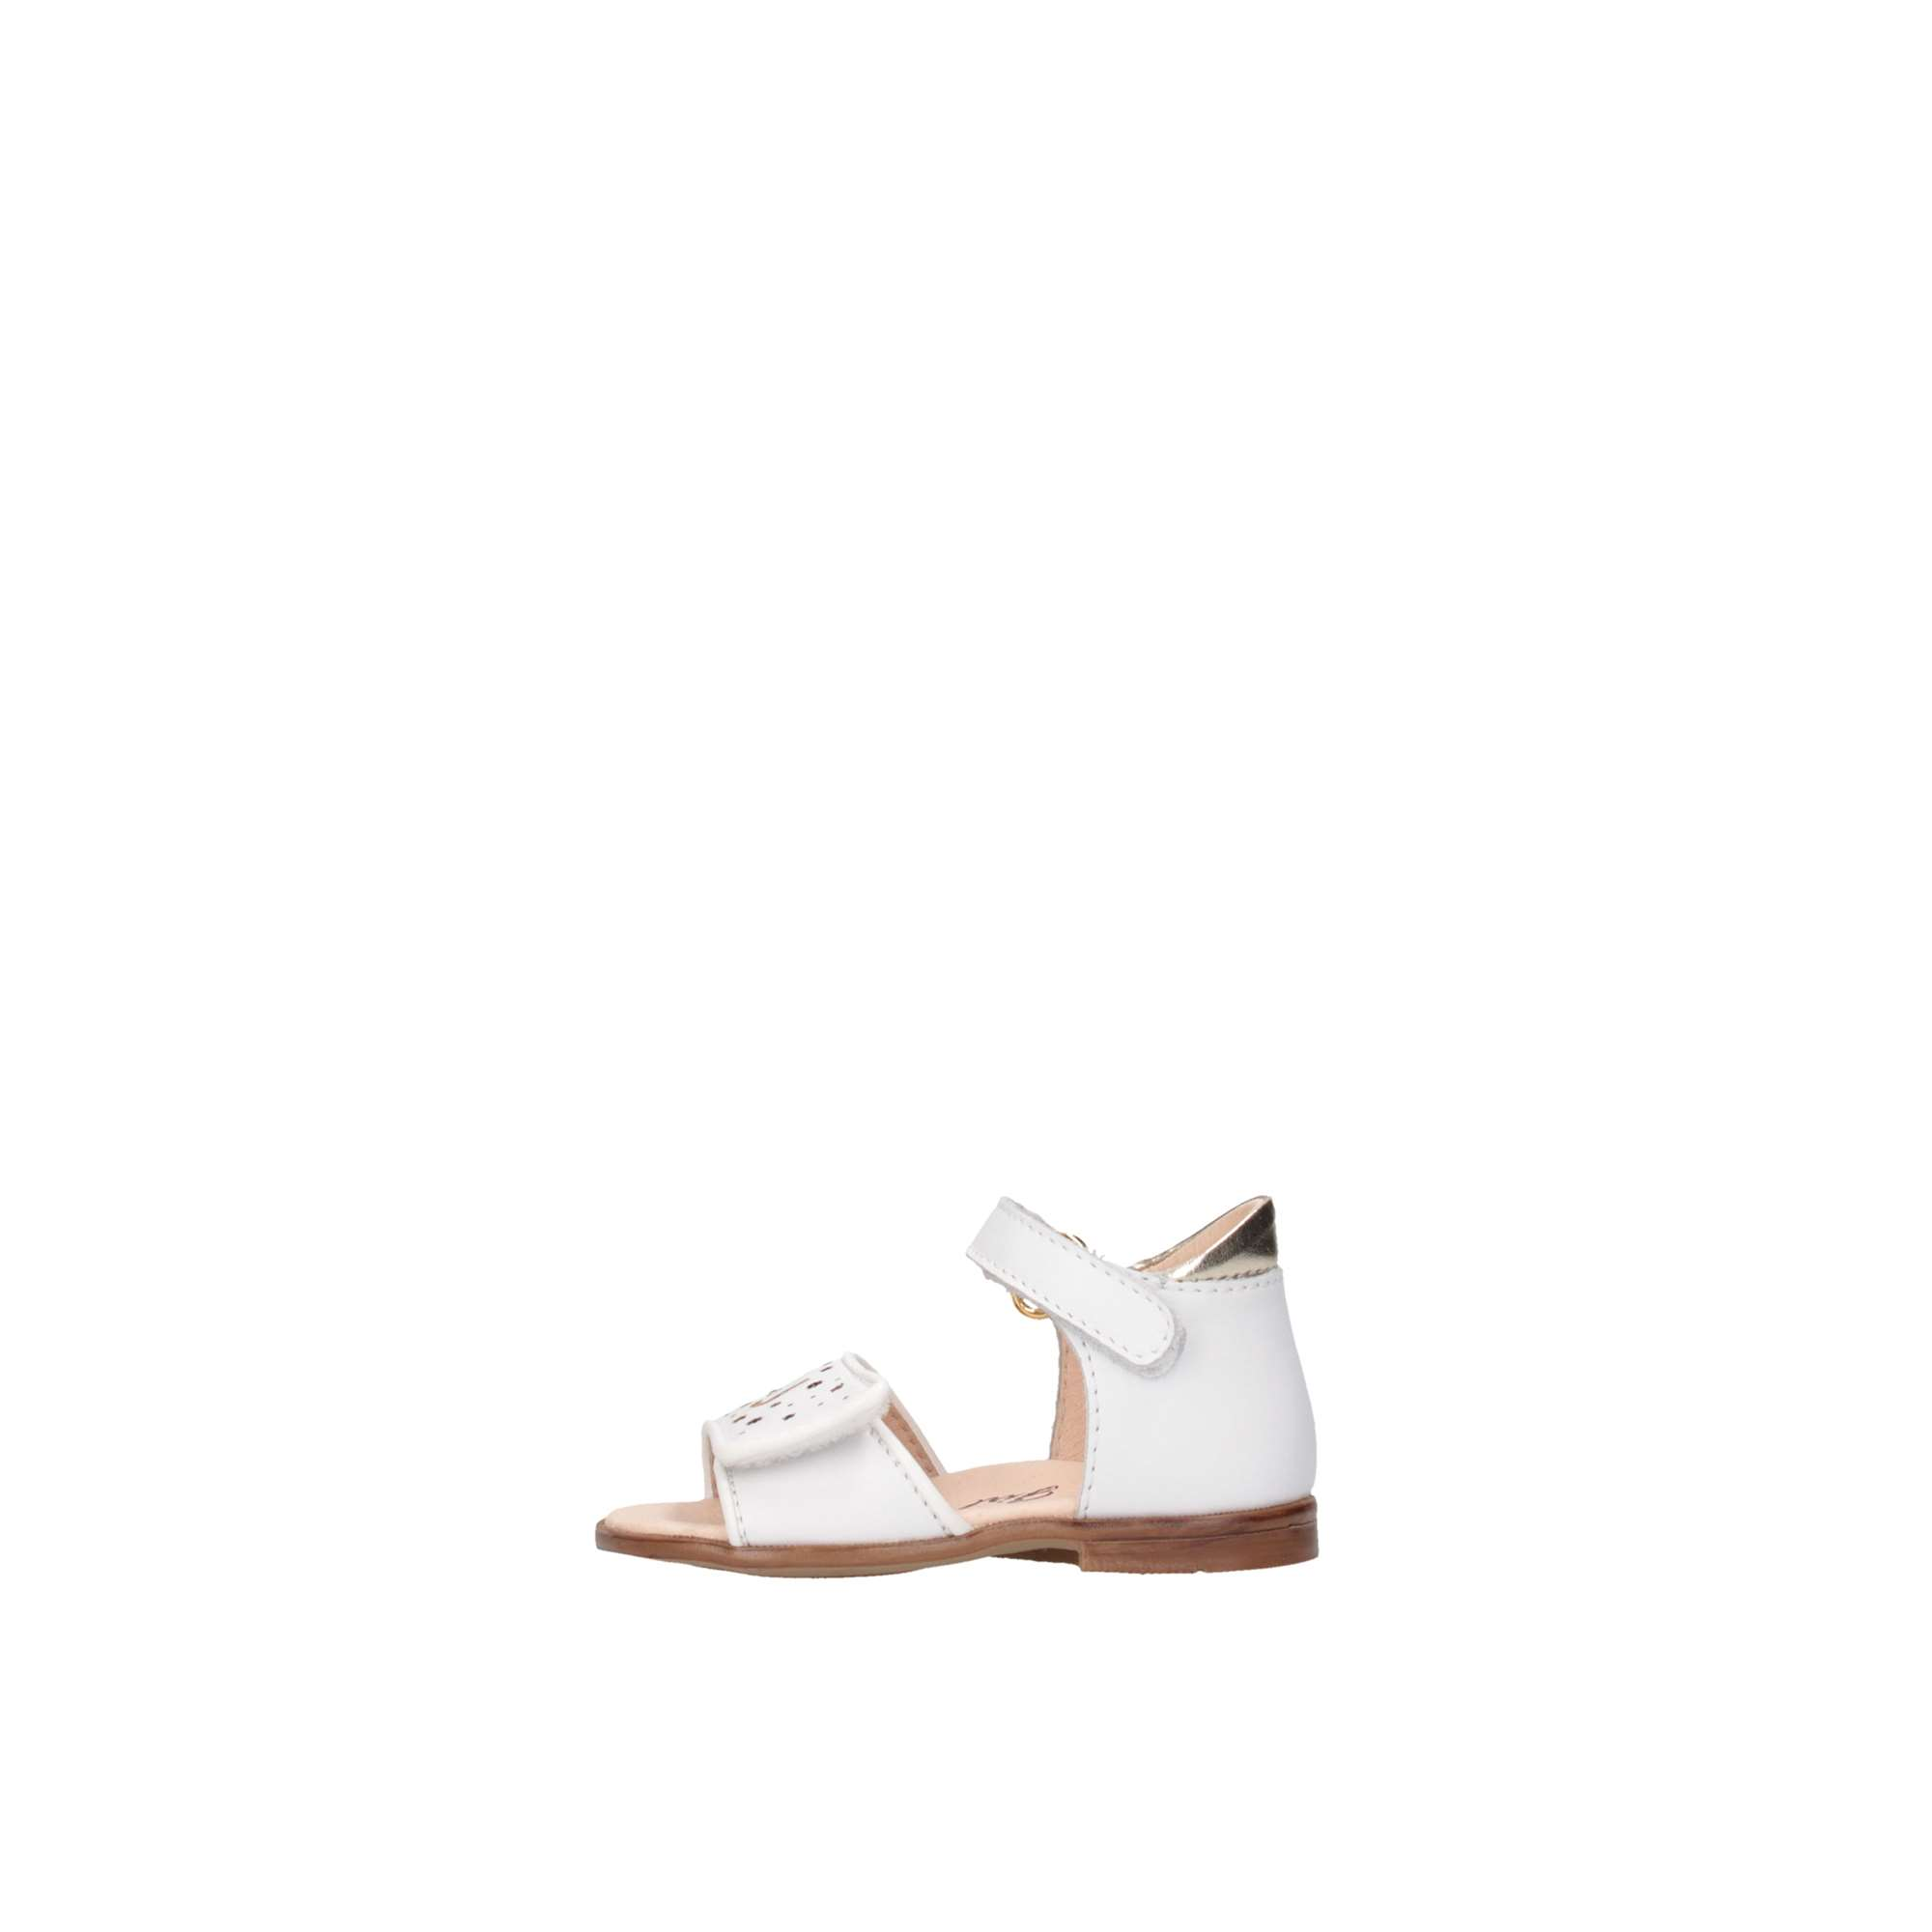 Sandalo-Bambina-Liu-Jo-Girl-UI23140A-Primavera-Estate